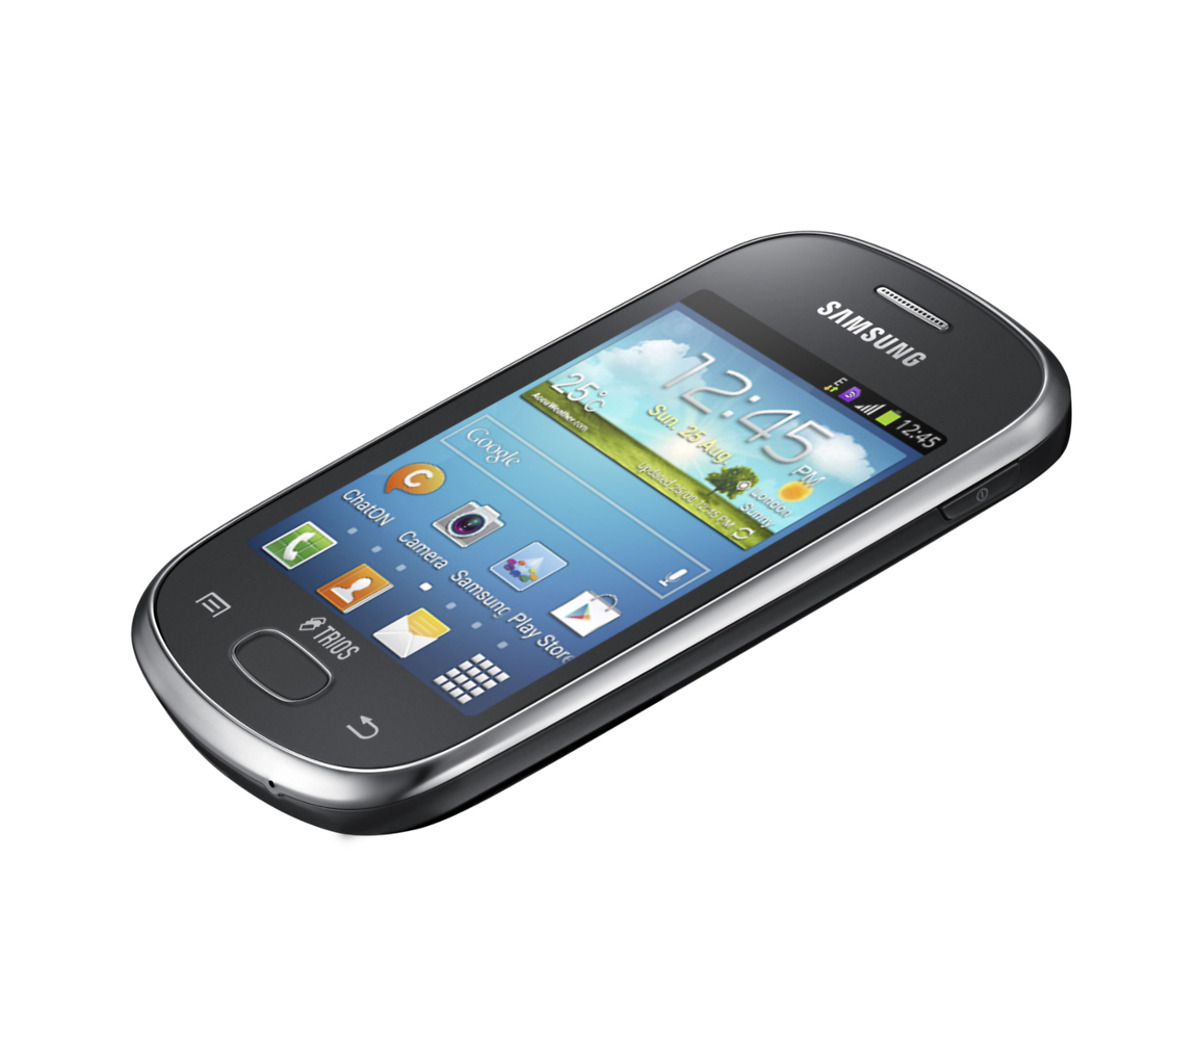 Pelicula Protetora para Samsung Galaxy Star Trios S5282 S5283 Fosca